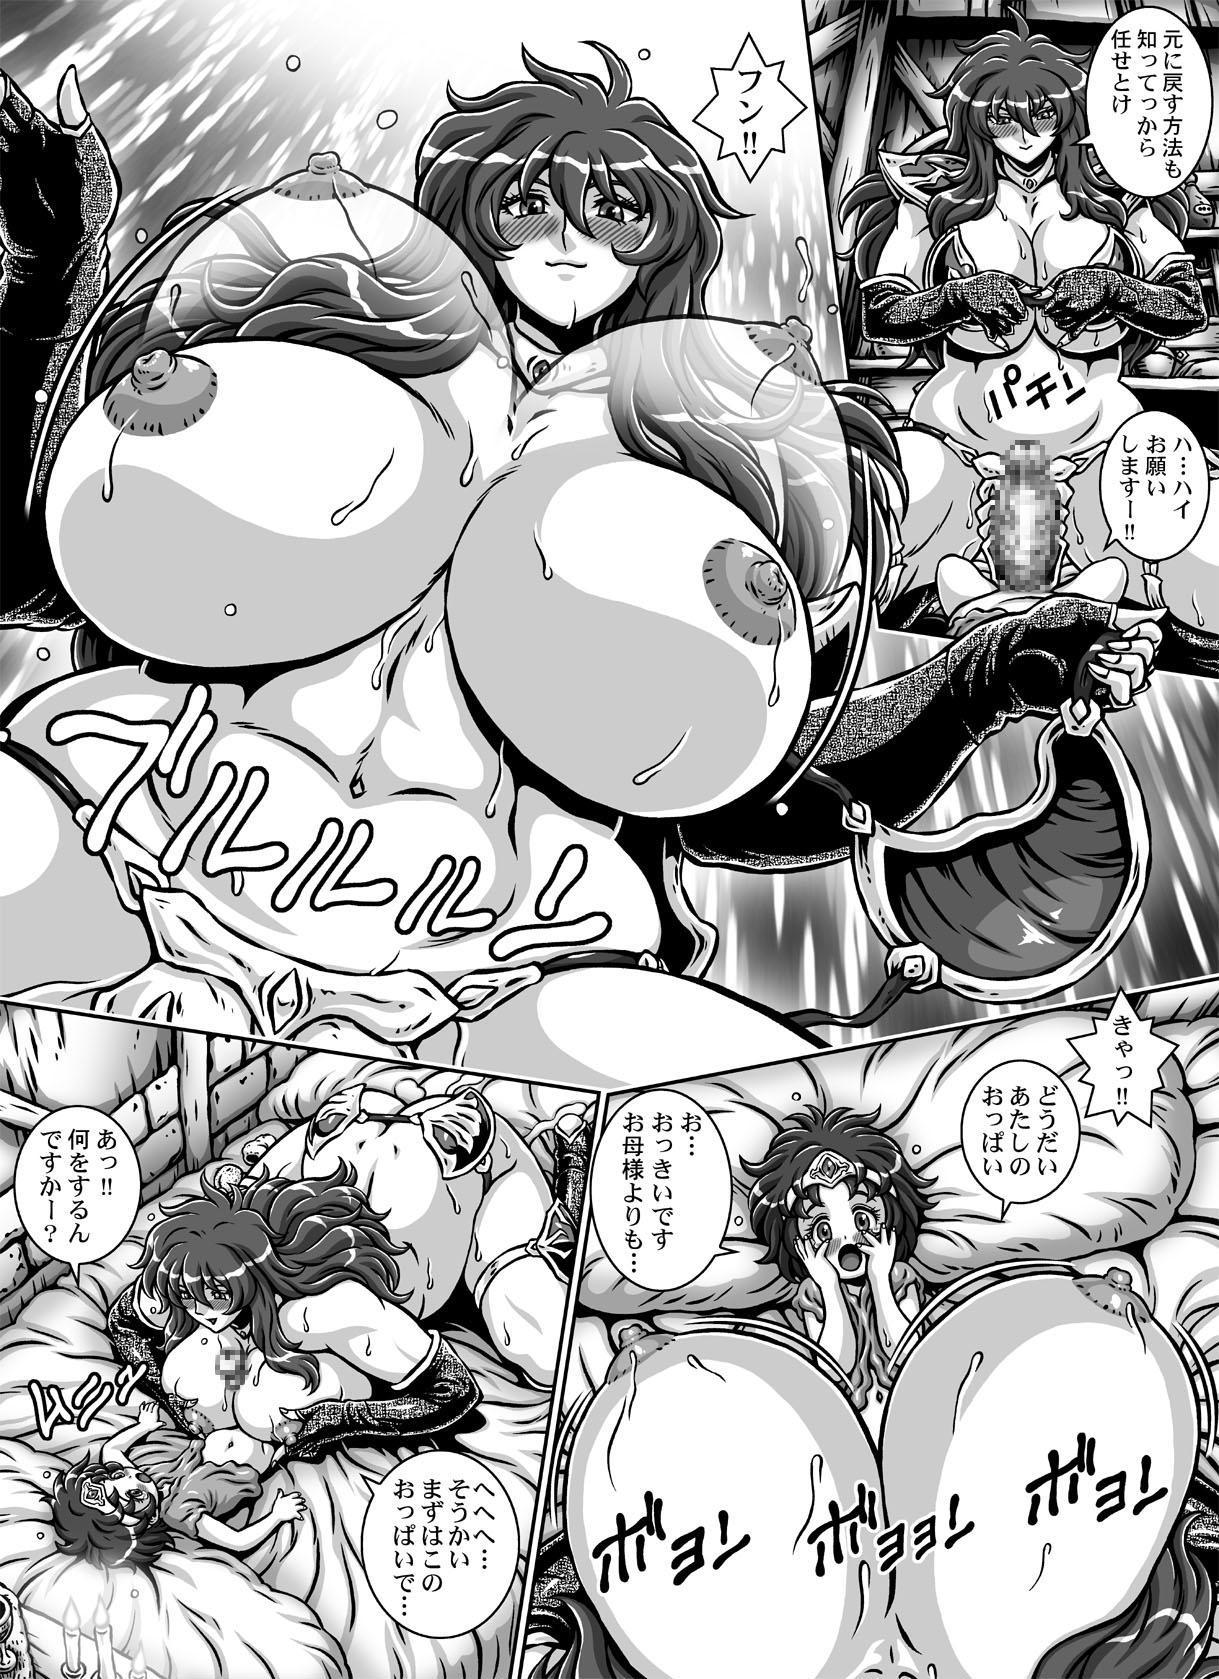 [Naginata-kan (Matsurino Naginata)] D-Q-R ~PROOF OF THE HERO~ (Dragon Quest III) [Digital] 37